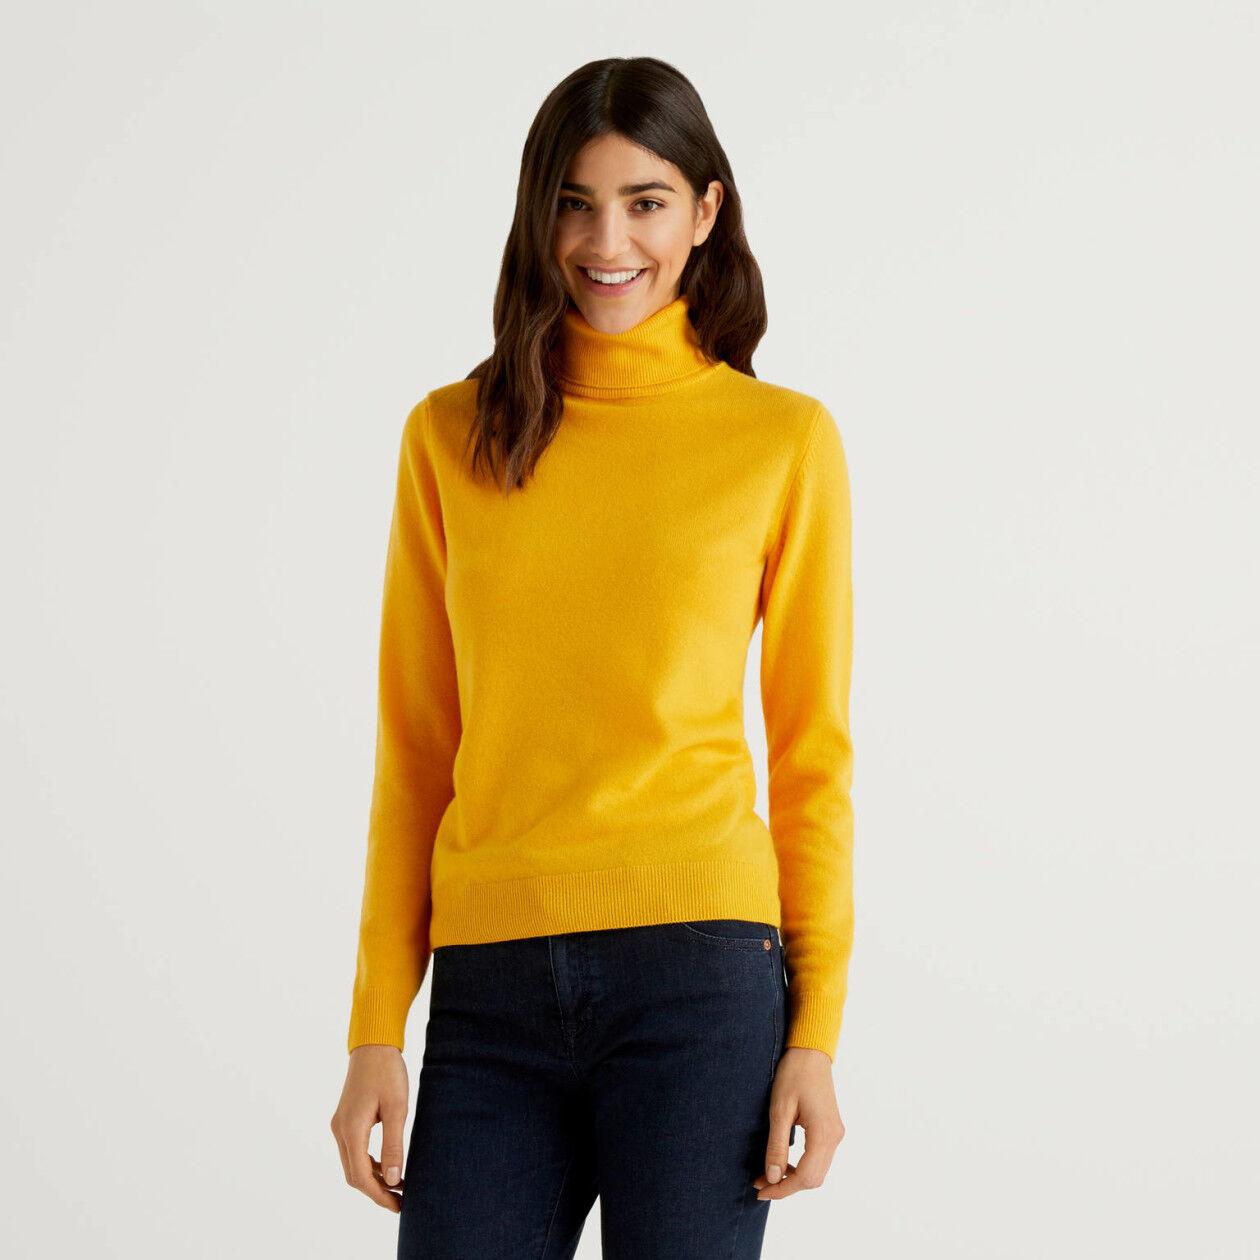 Yellow turtleneck sweater in pure virgin wool